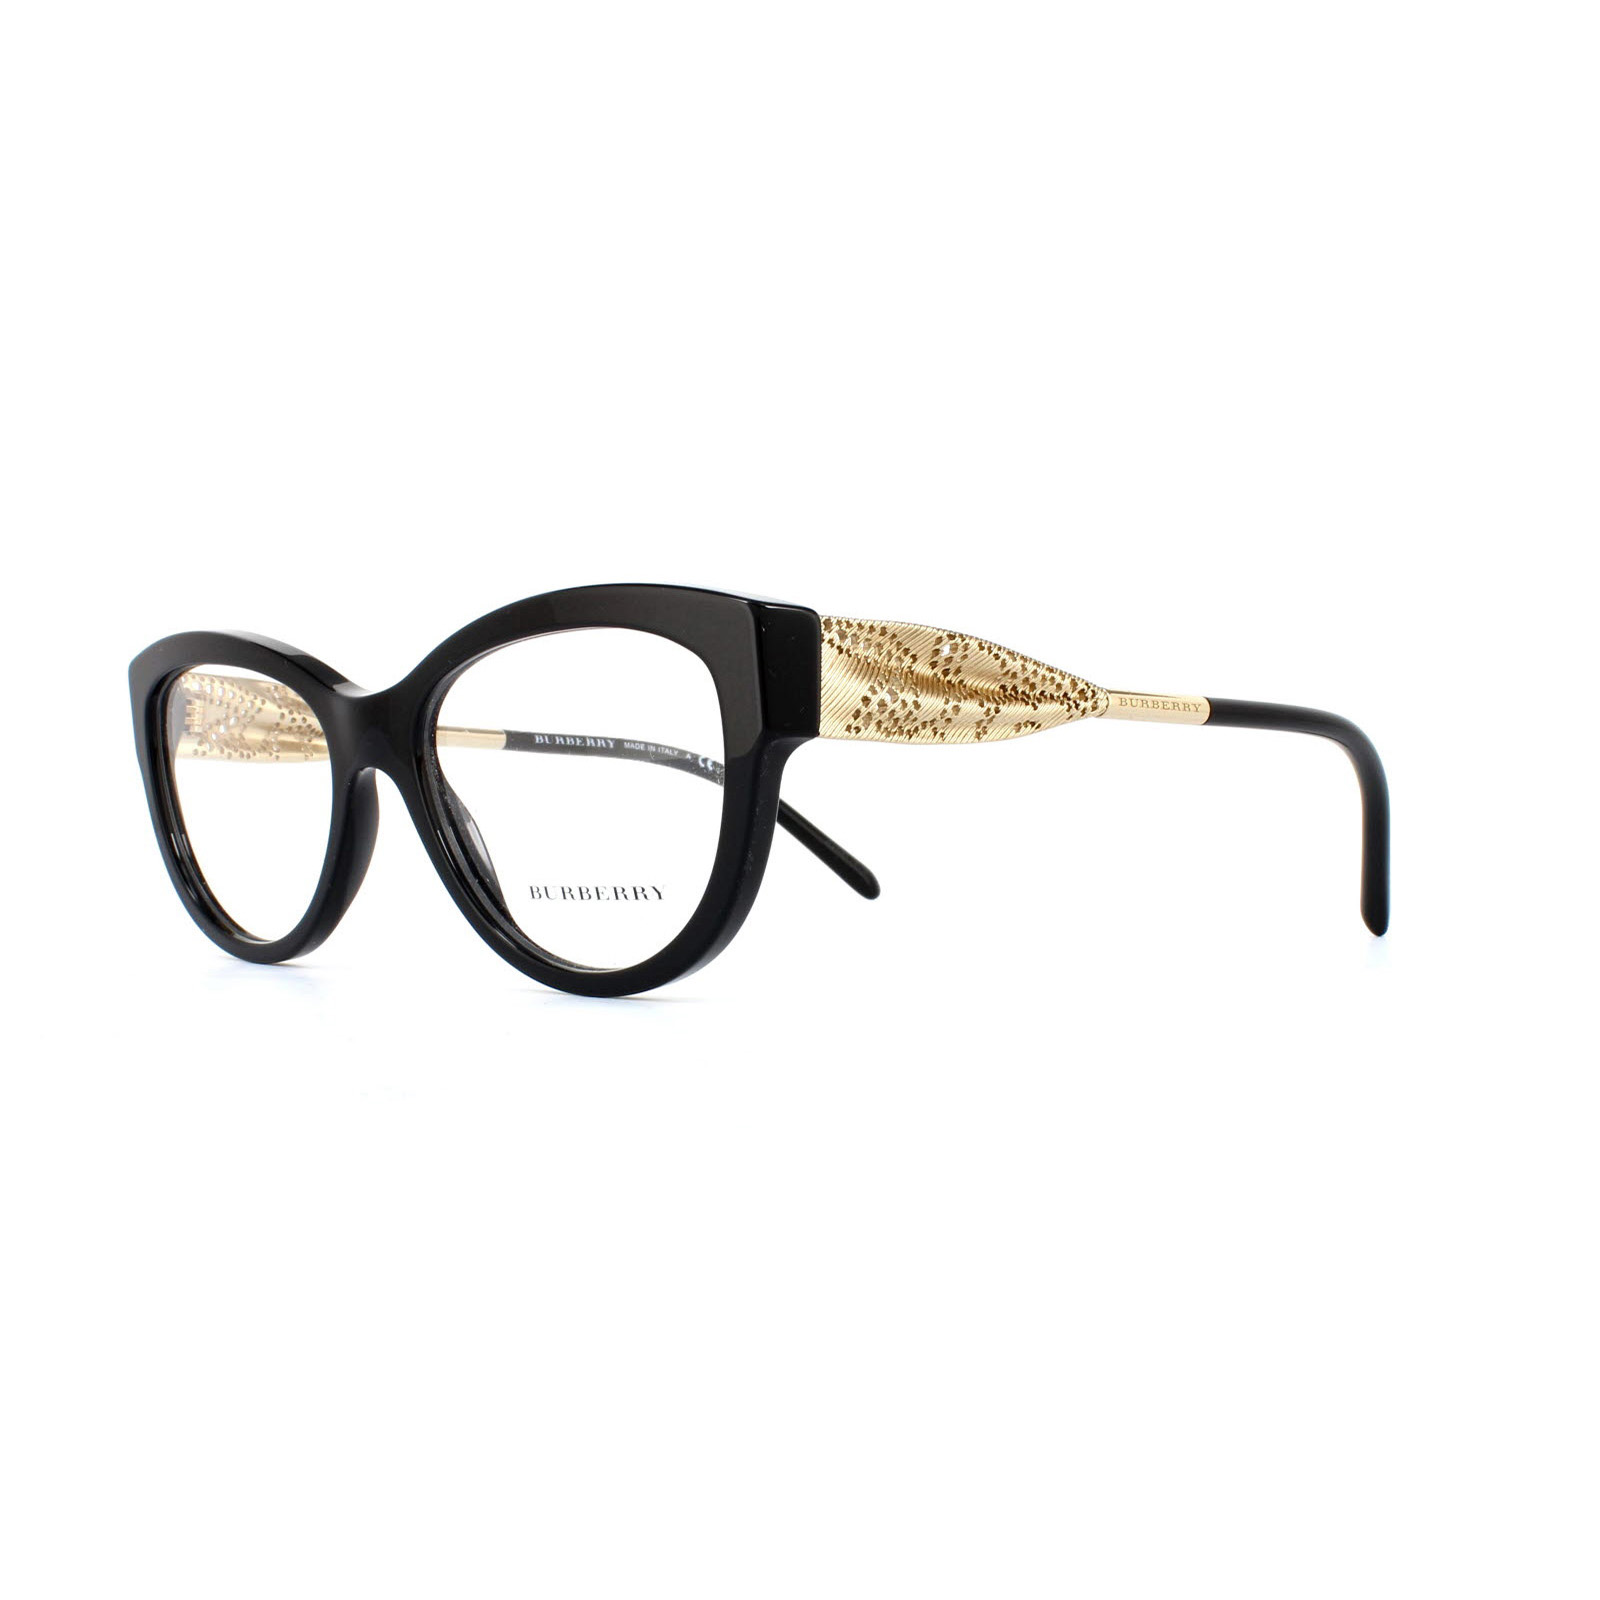 a3f1ac33ad5 Sentinel Burberry Glasses Frames 2210 3001 Black Womens 53mm